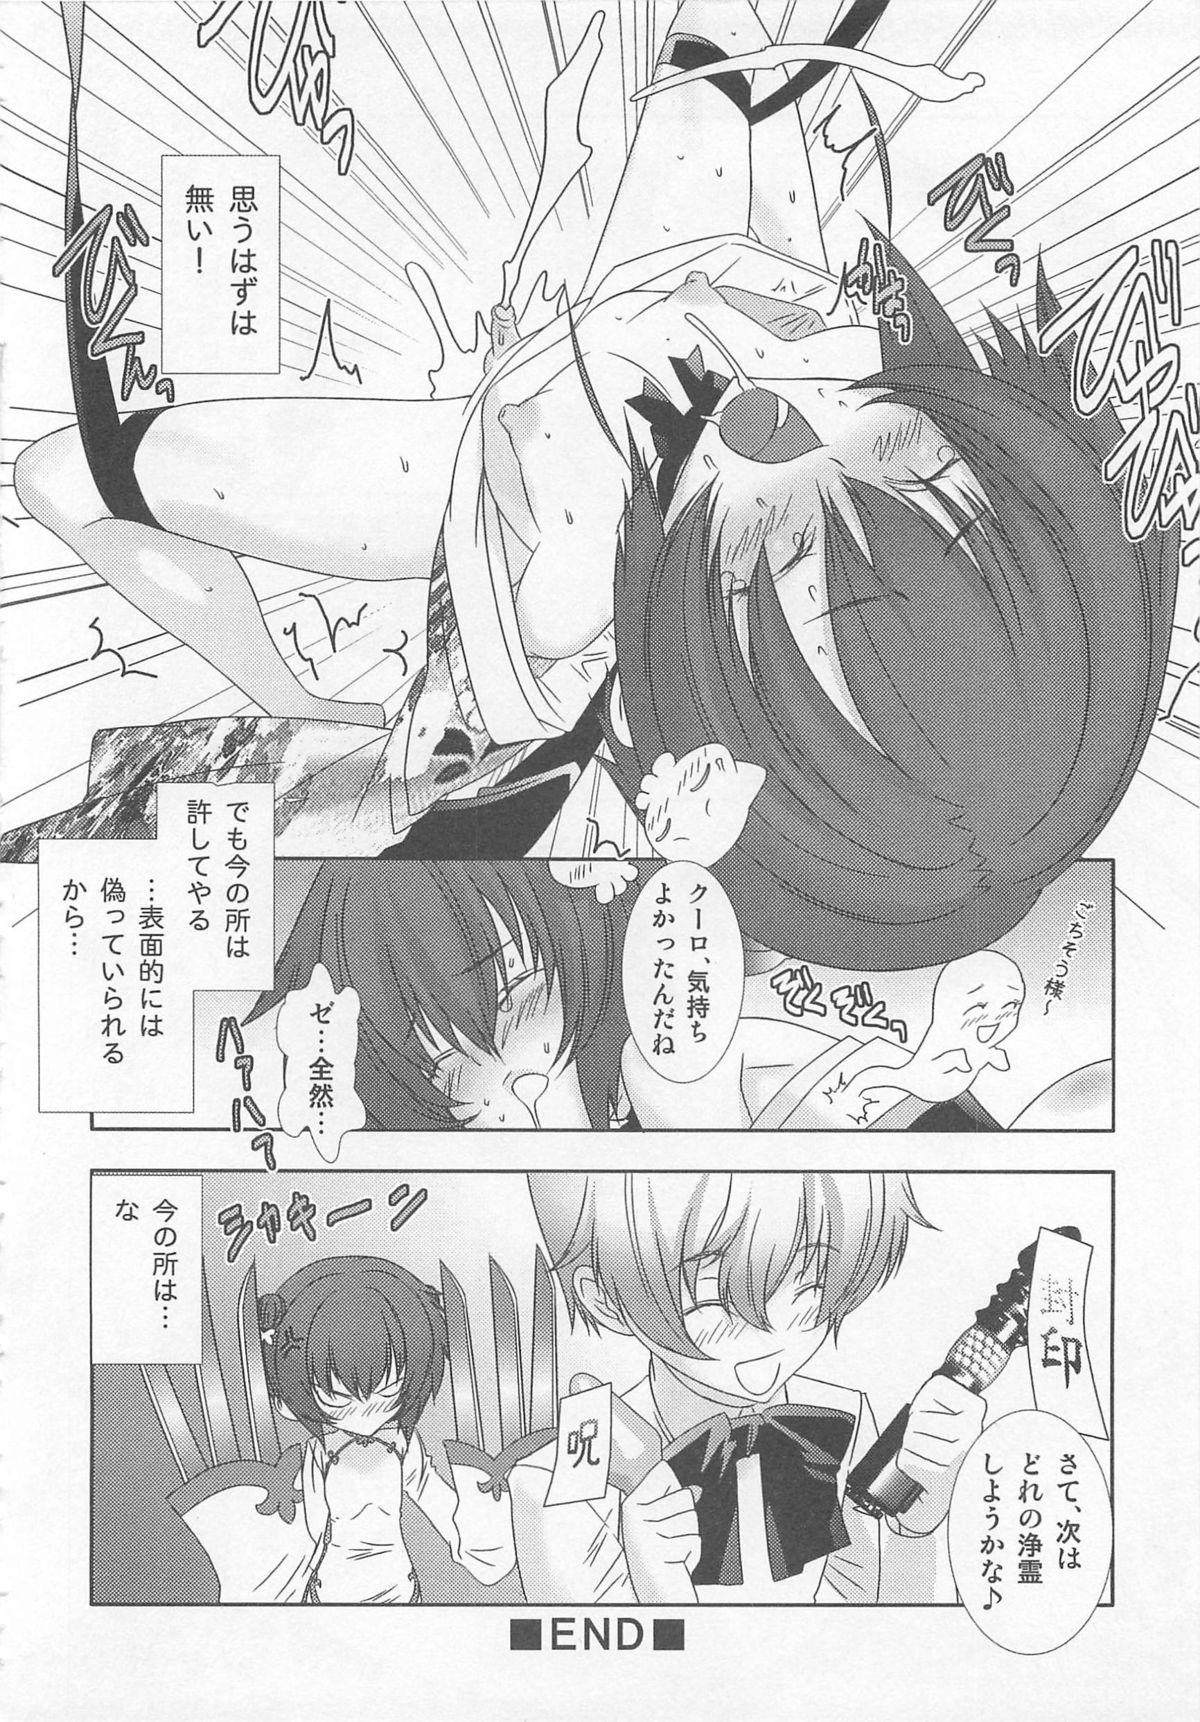 Otokonoko HEAVEN Vol. 02 Dokidoki Chikan Taiken 94